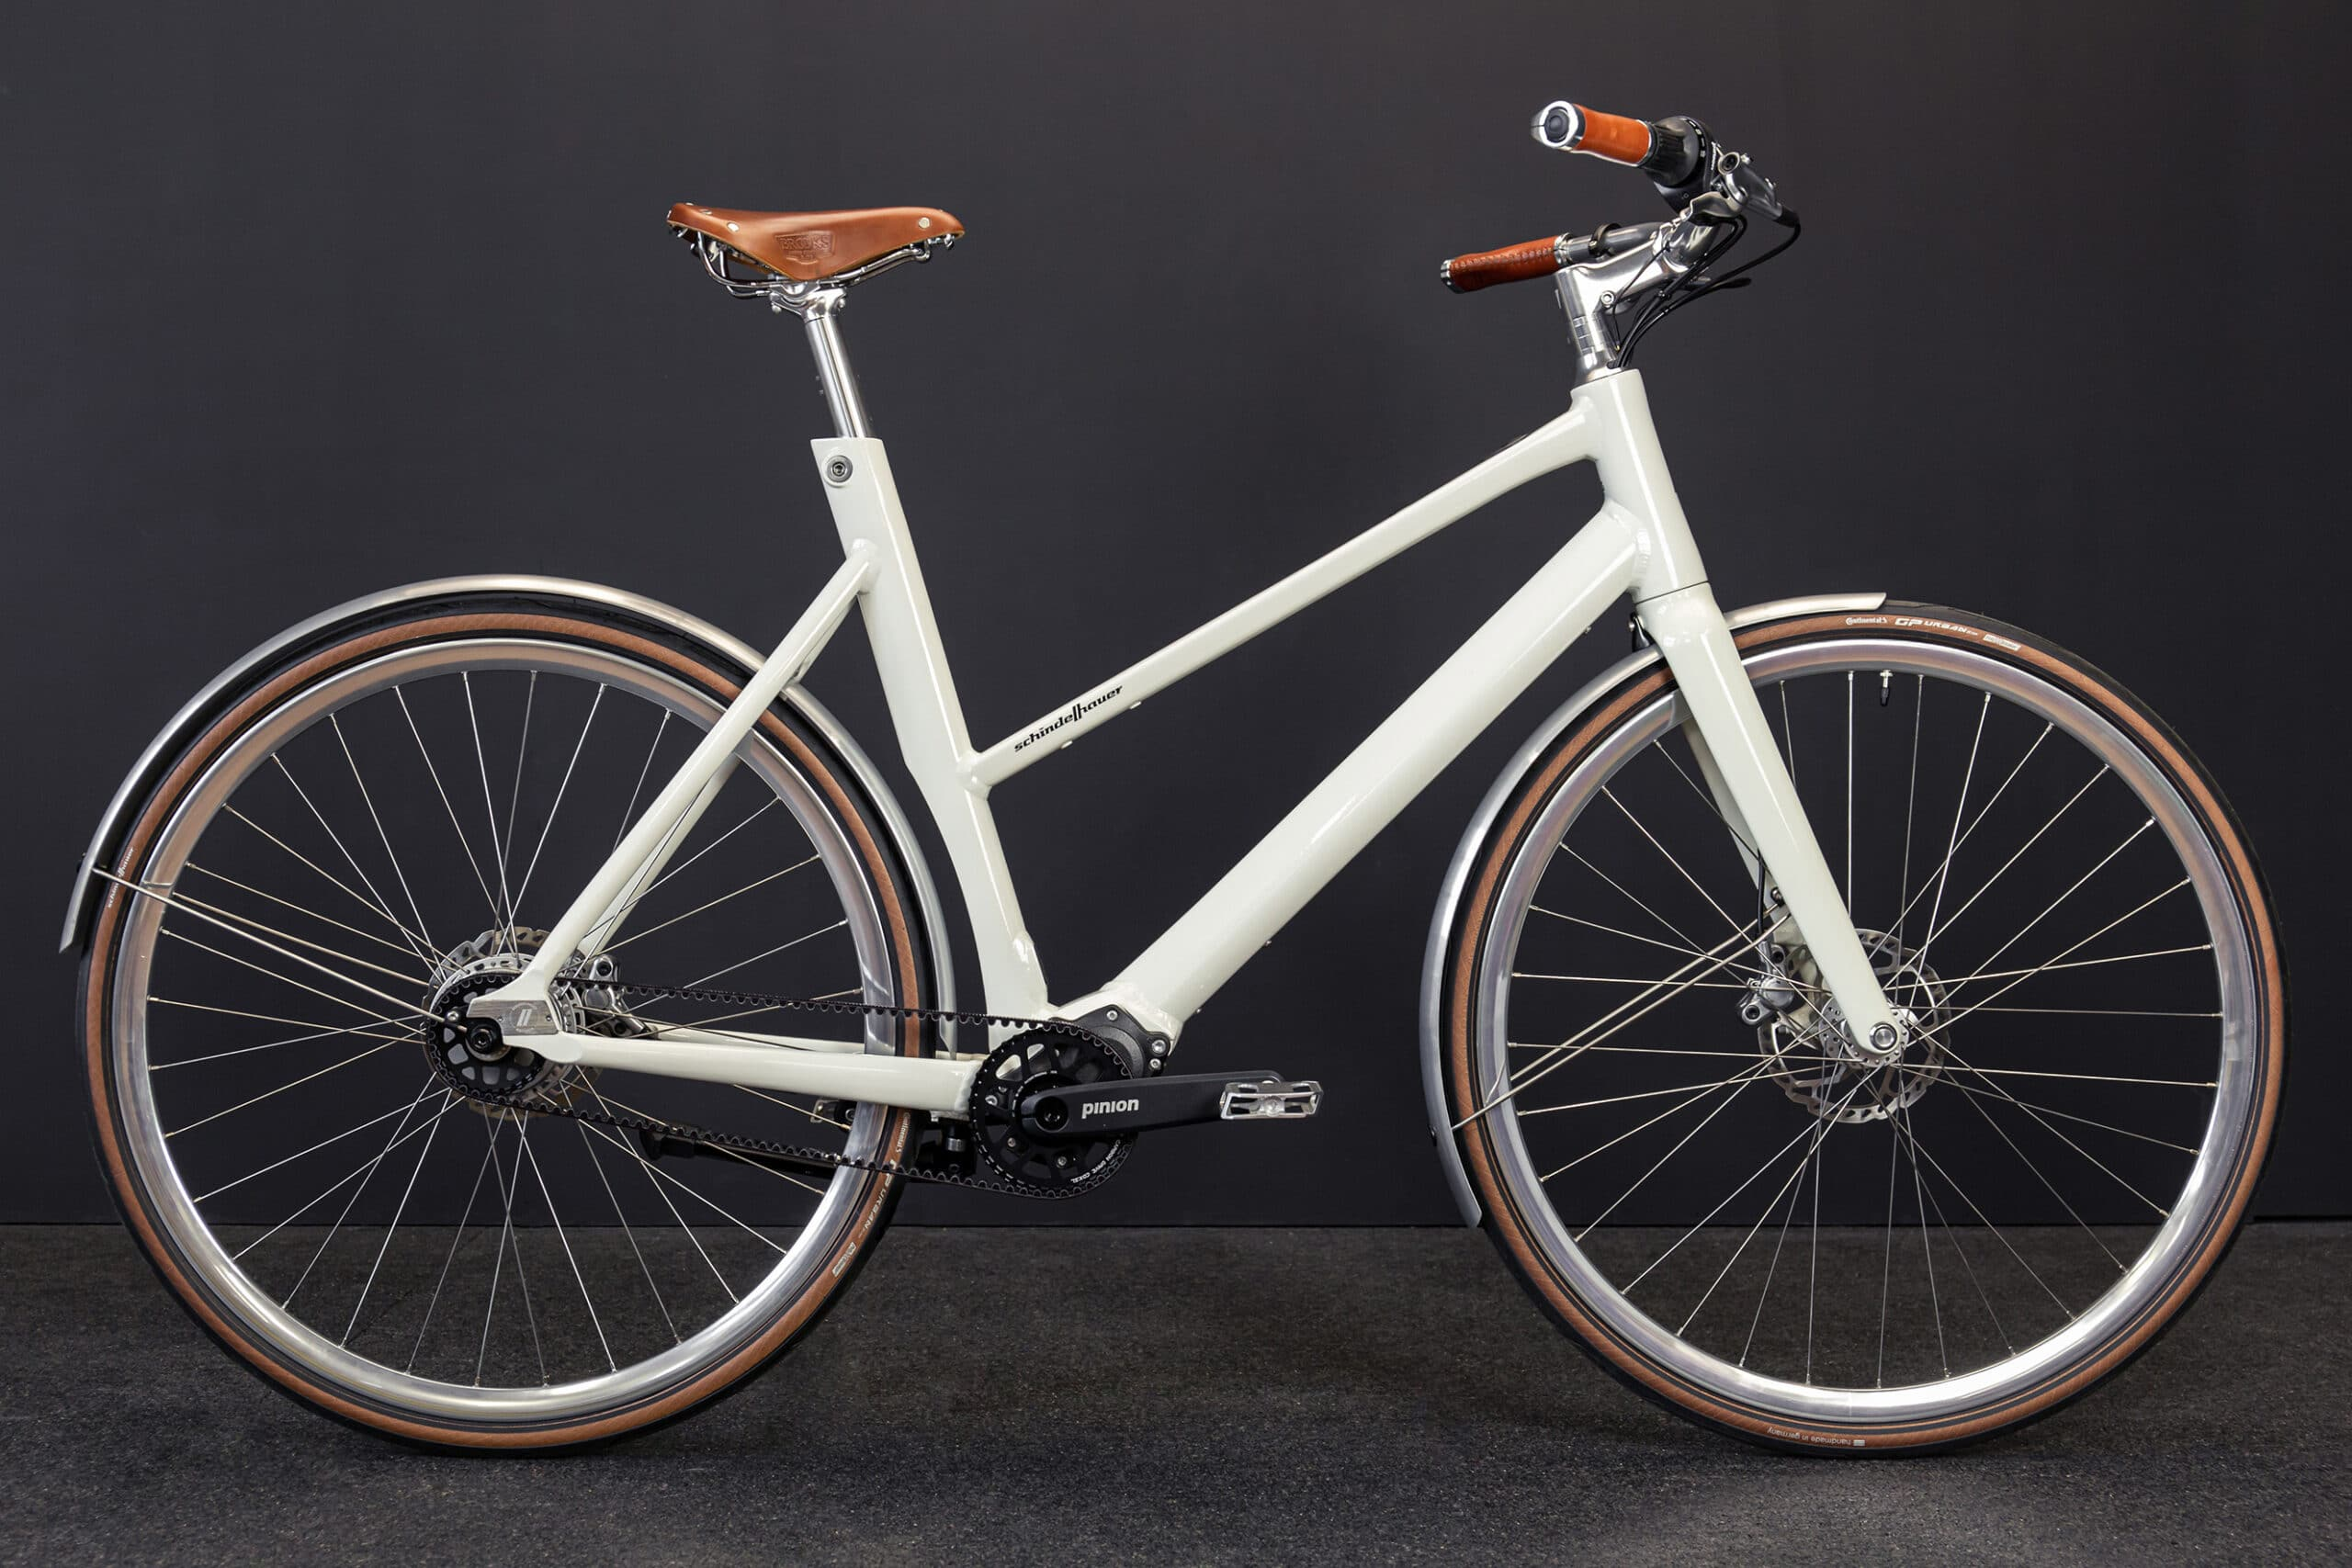 schindelhauer Antonia Pinion e-bike -1